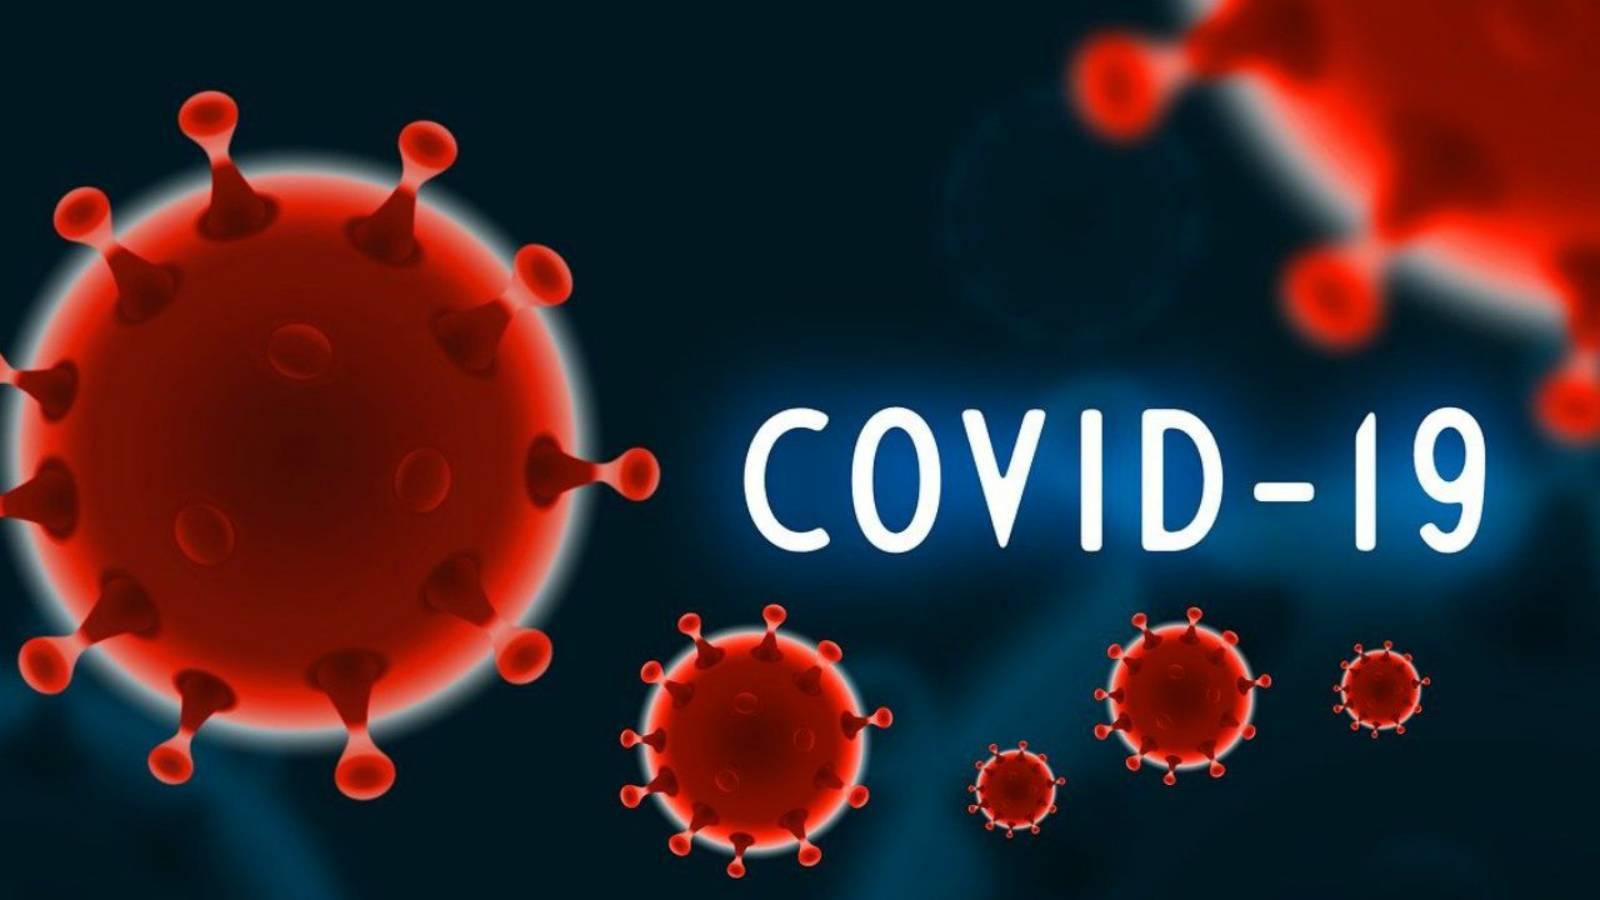 COVID-19 Romania pacienti asimptomatici pozitivi iesit spital